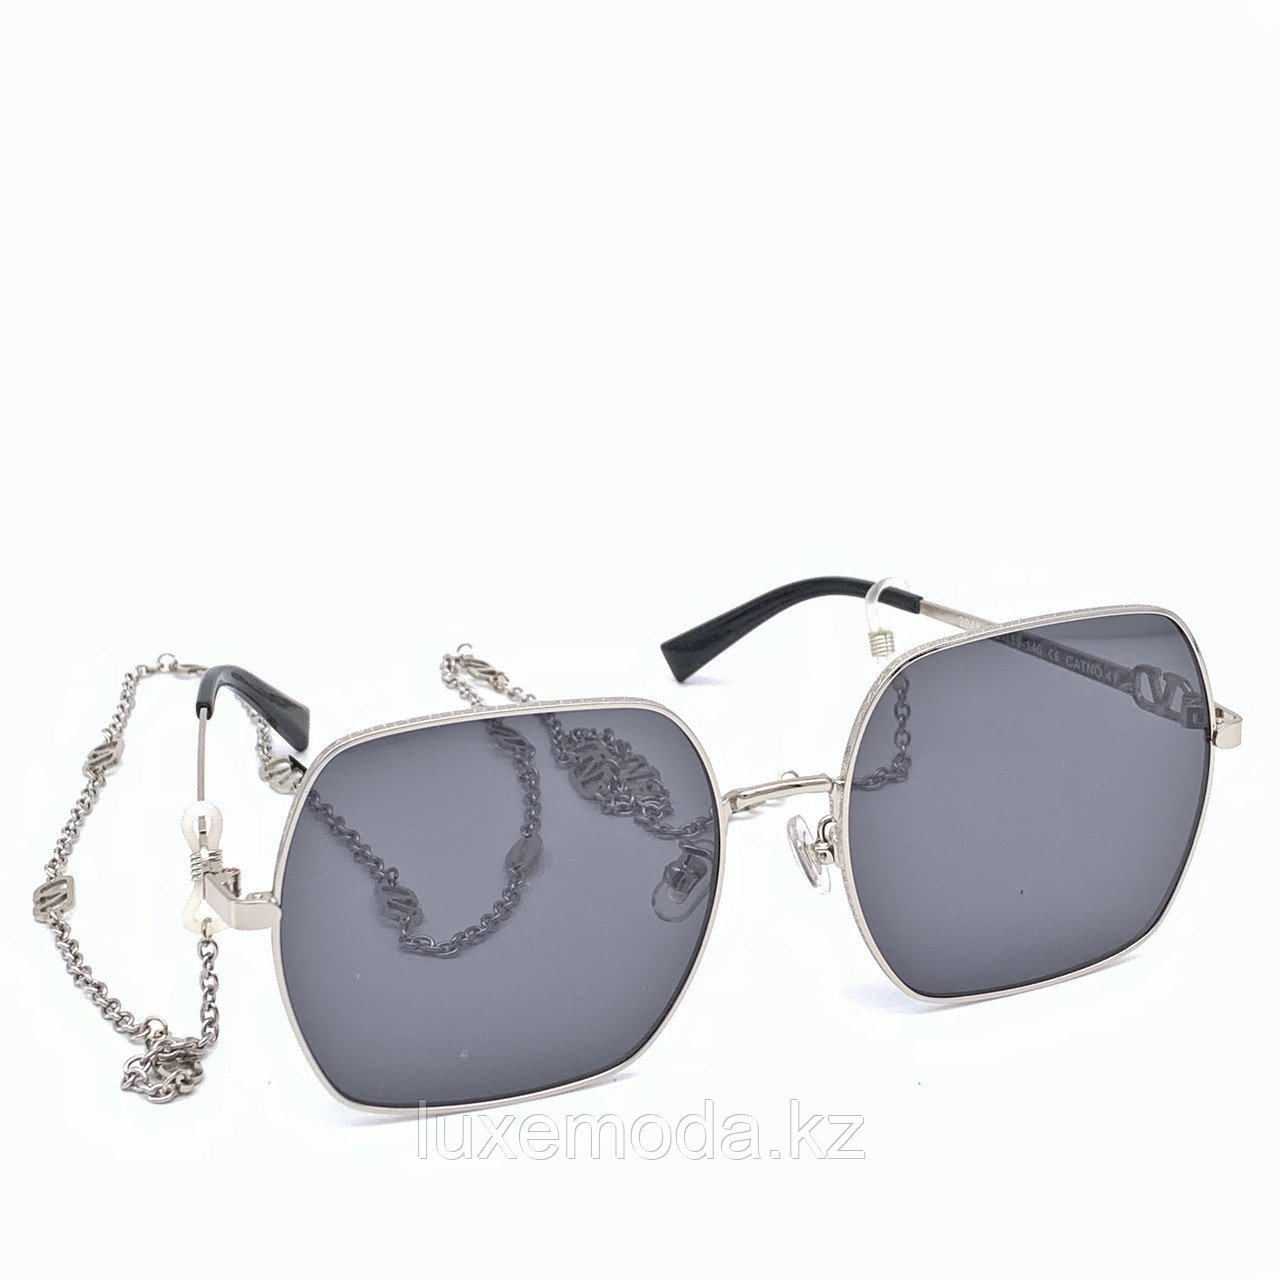 Очки женские Valentino